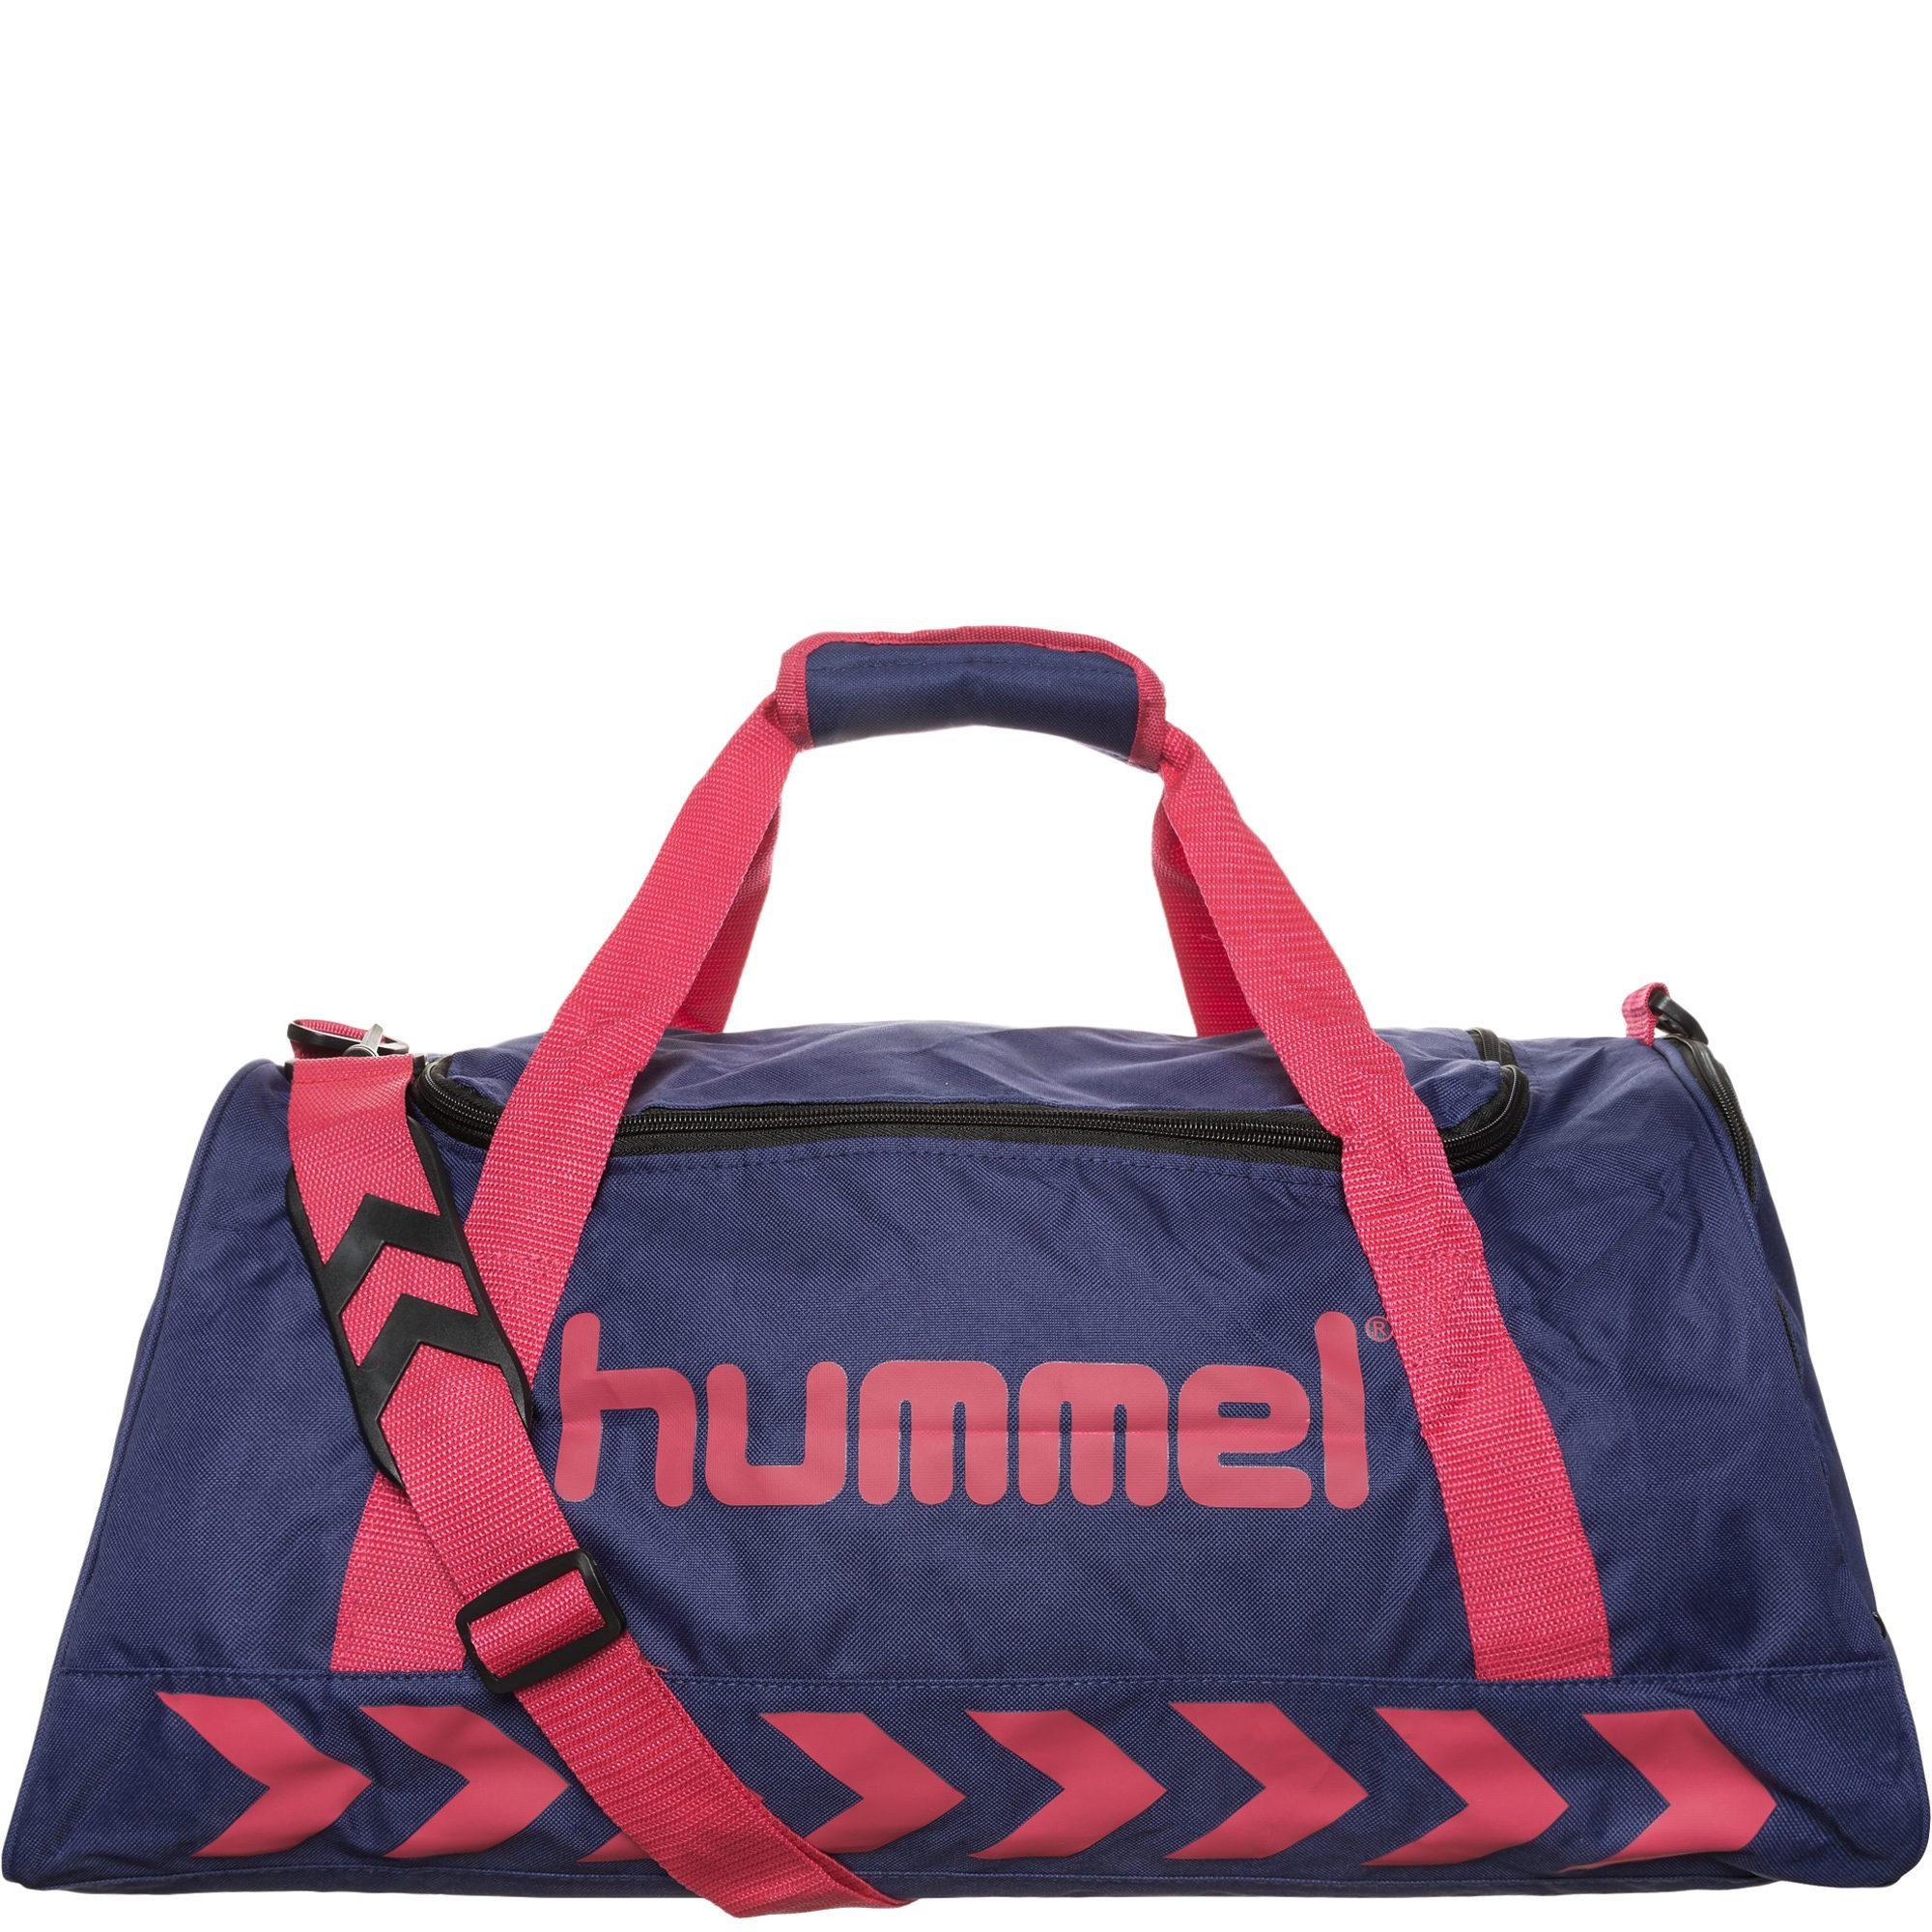 HUMMEL TEAMSPORT Authentic Sporttasche